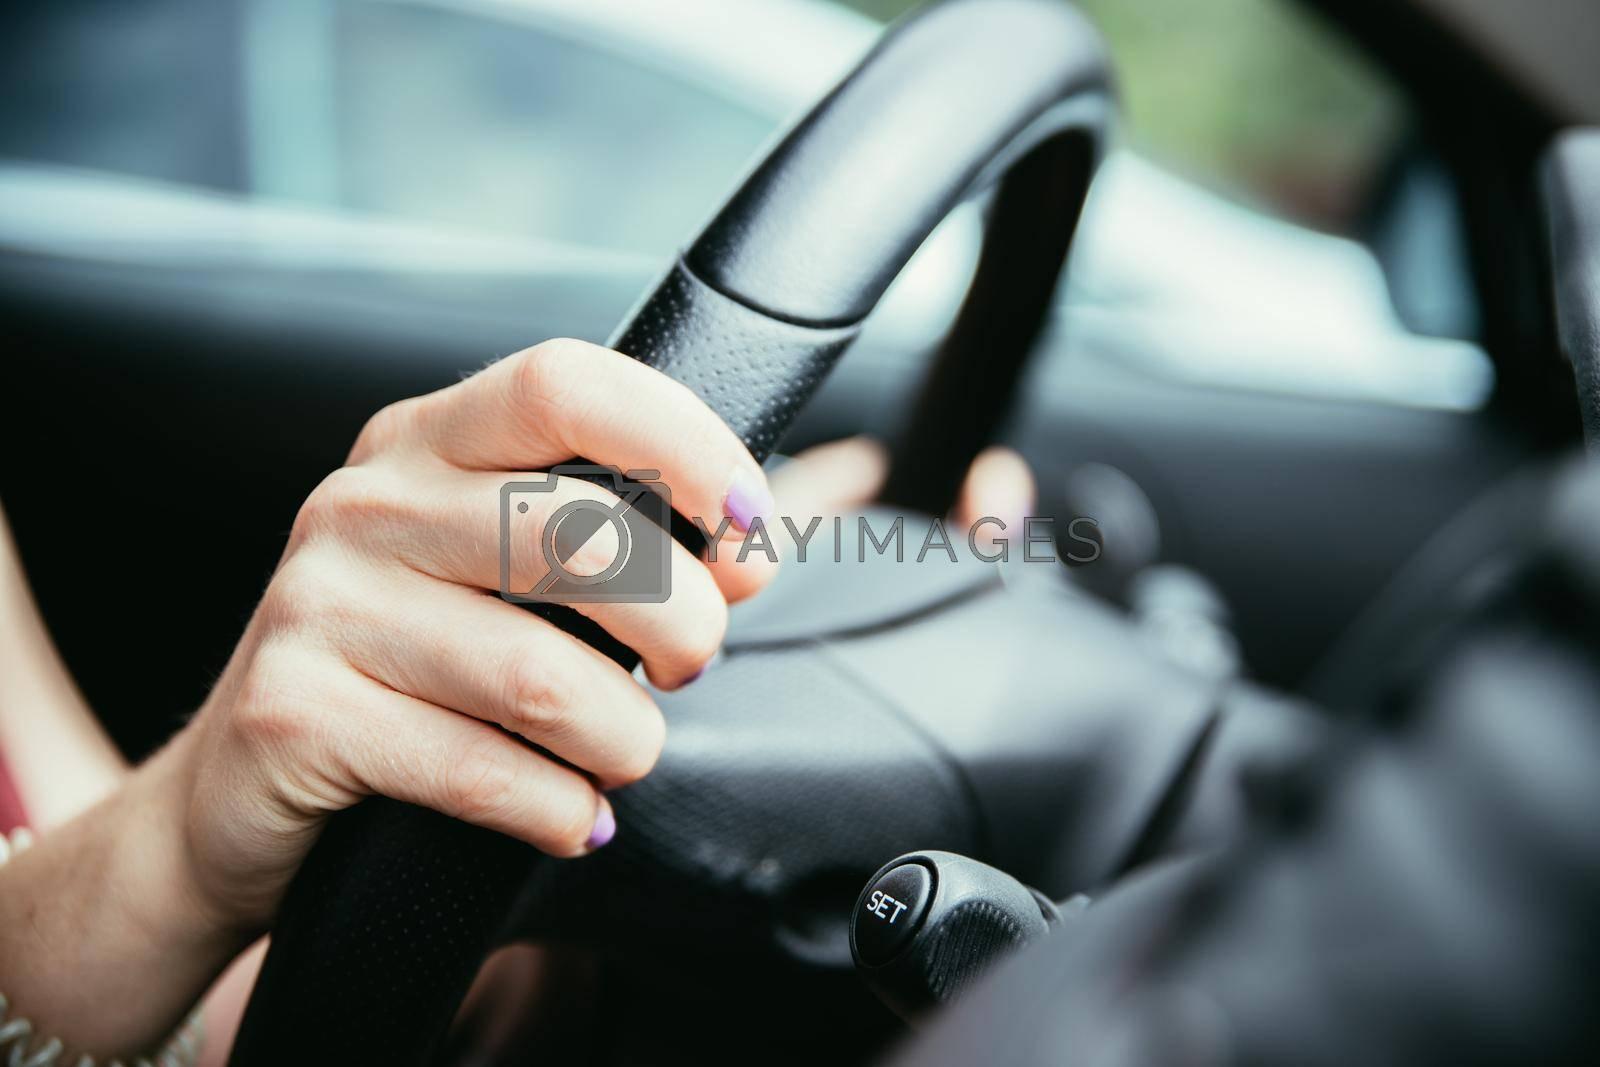 Female hands on a sports car steering wheel, car interior